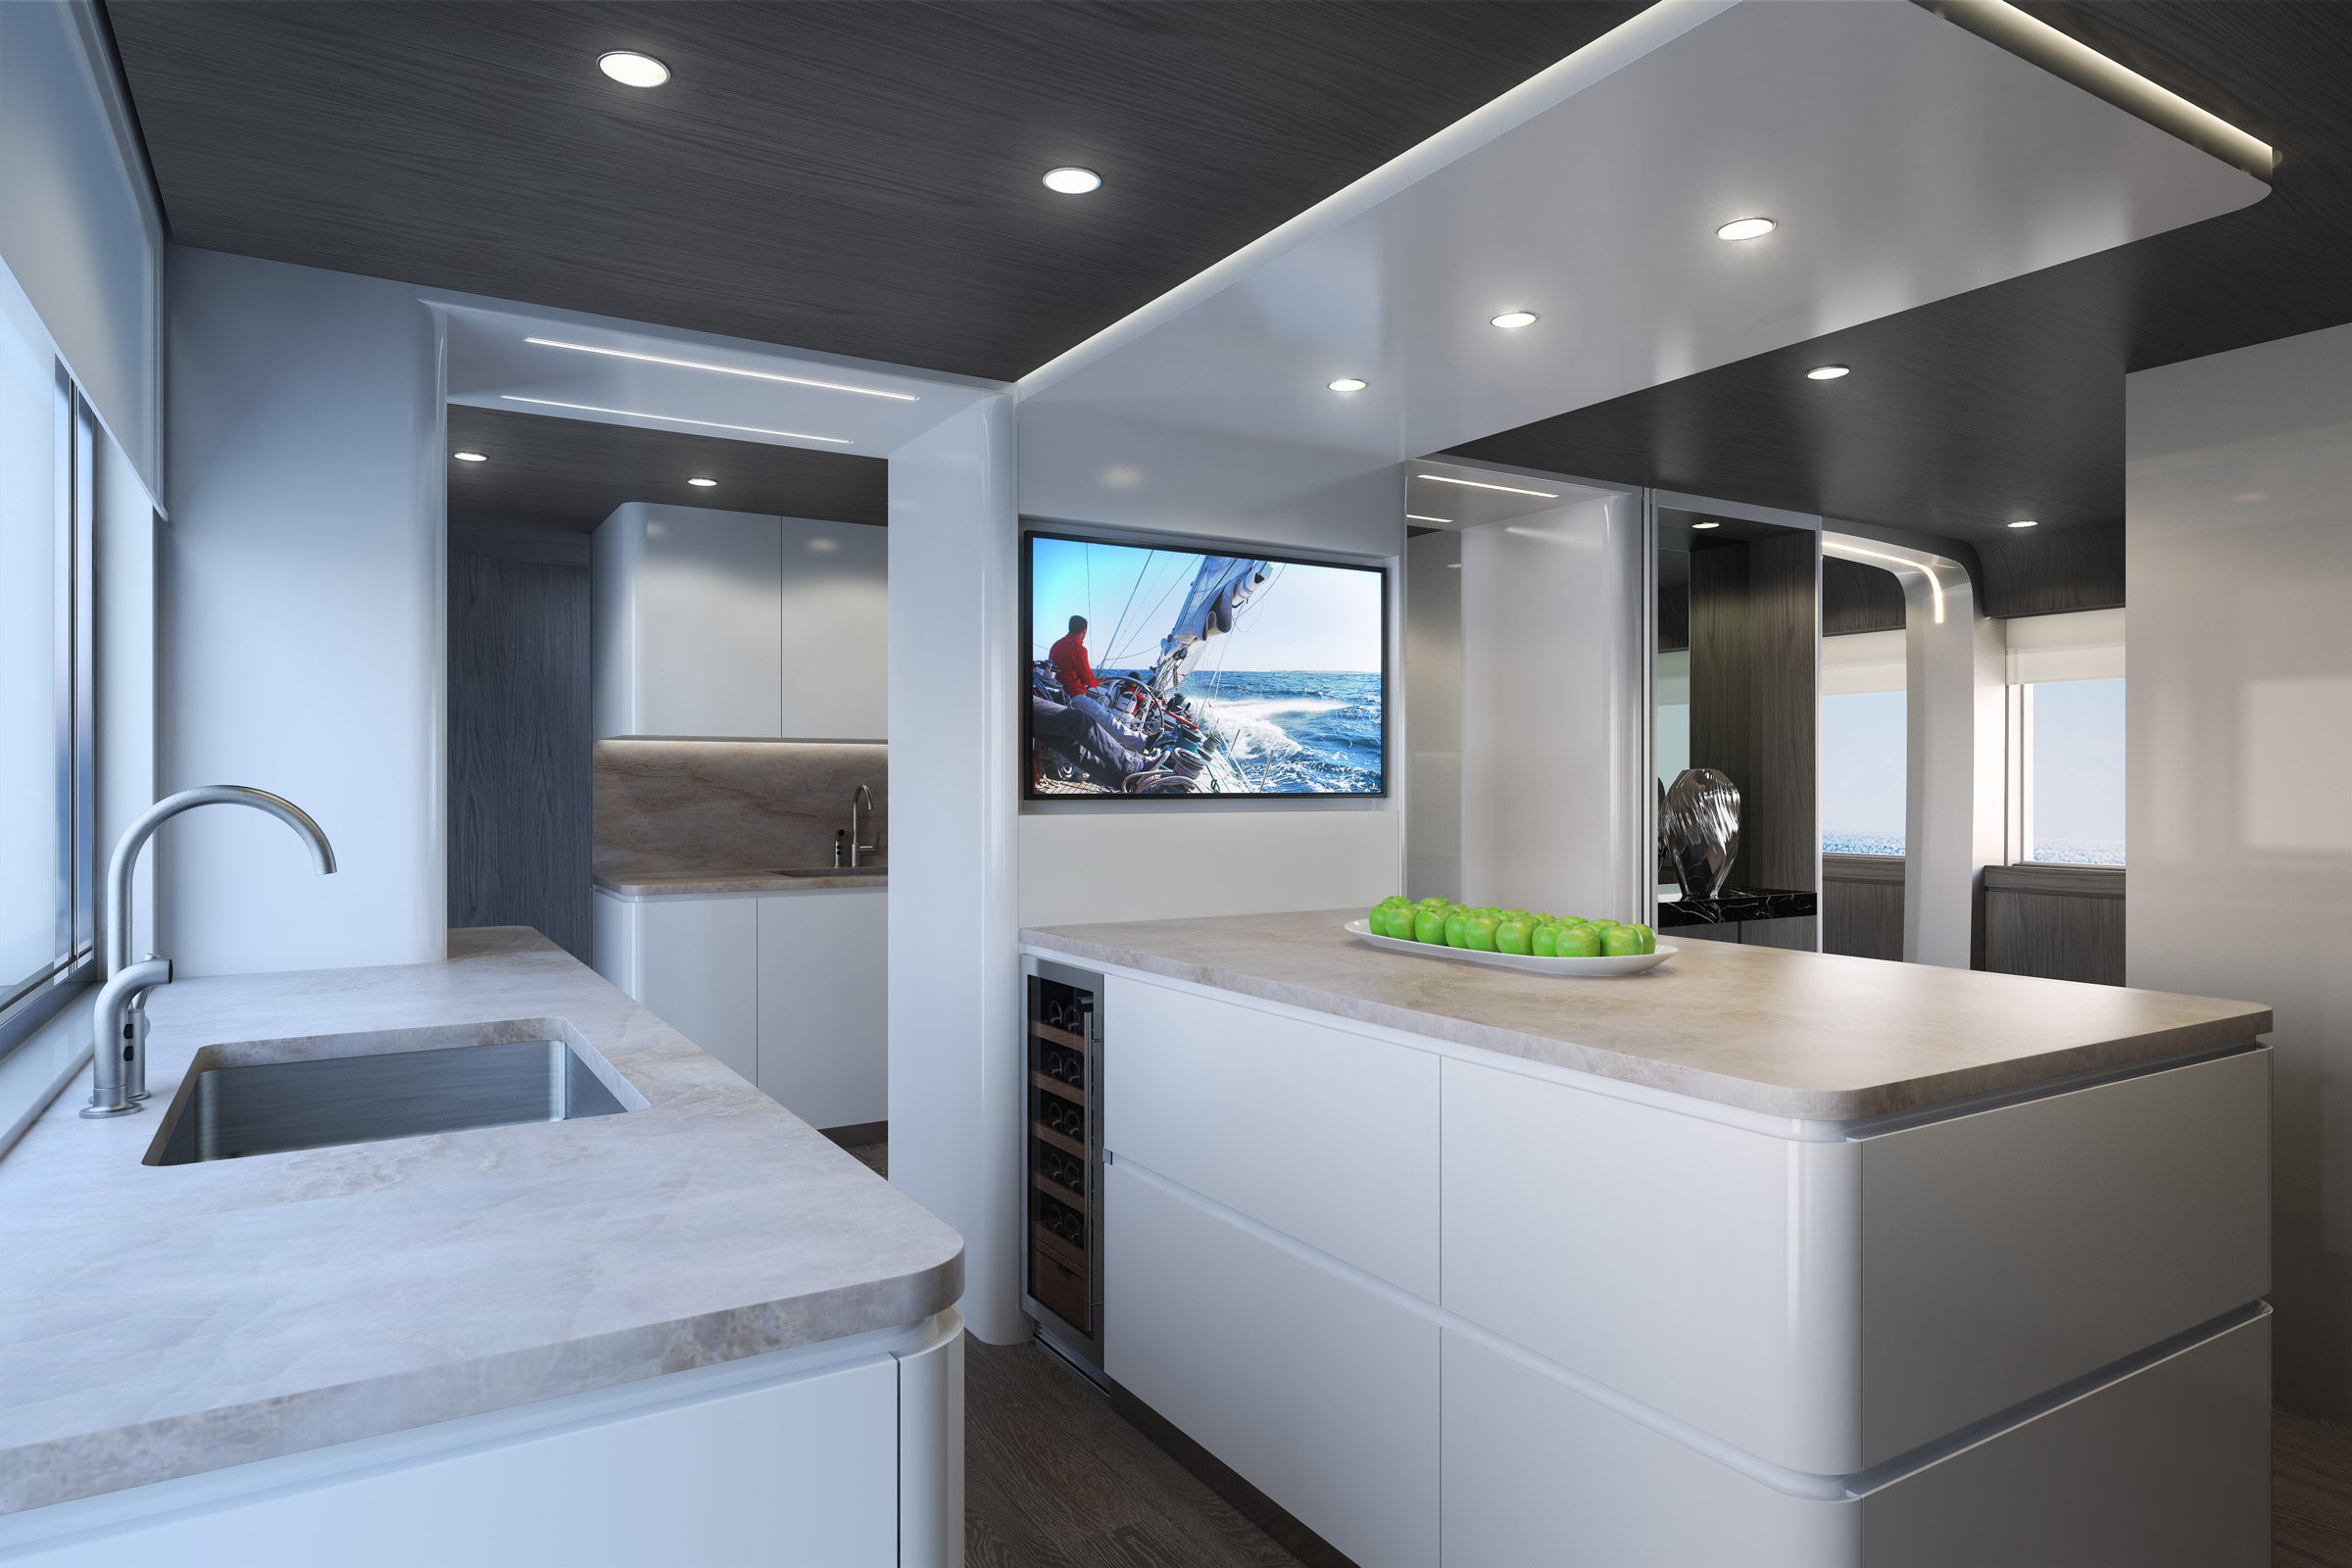 HH_Yacht_Kitchen_Cam2_V2_005